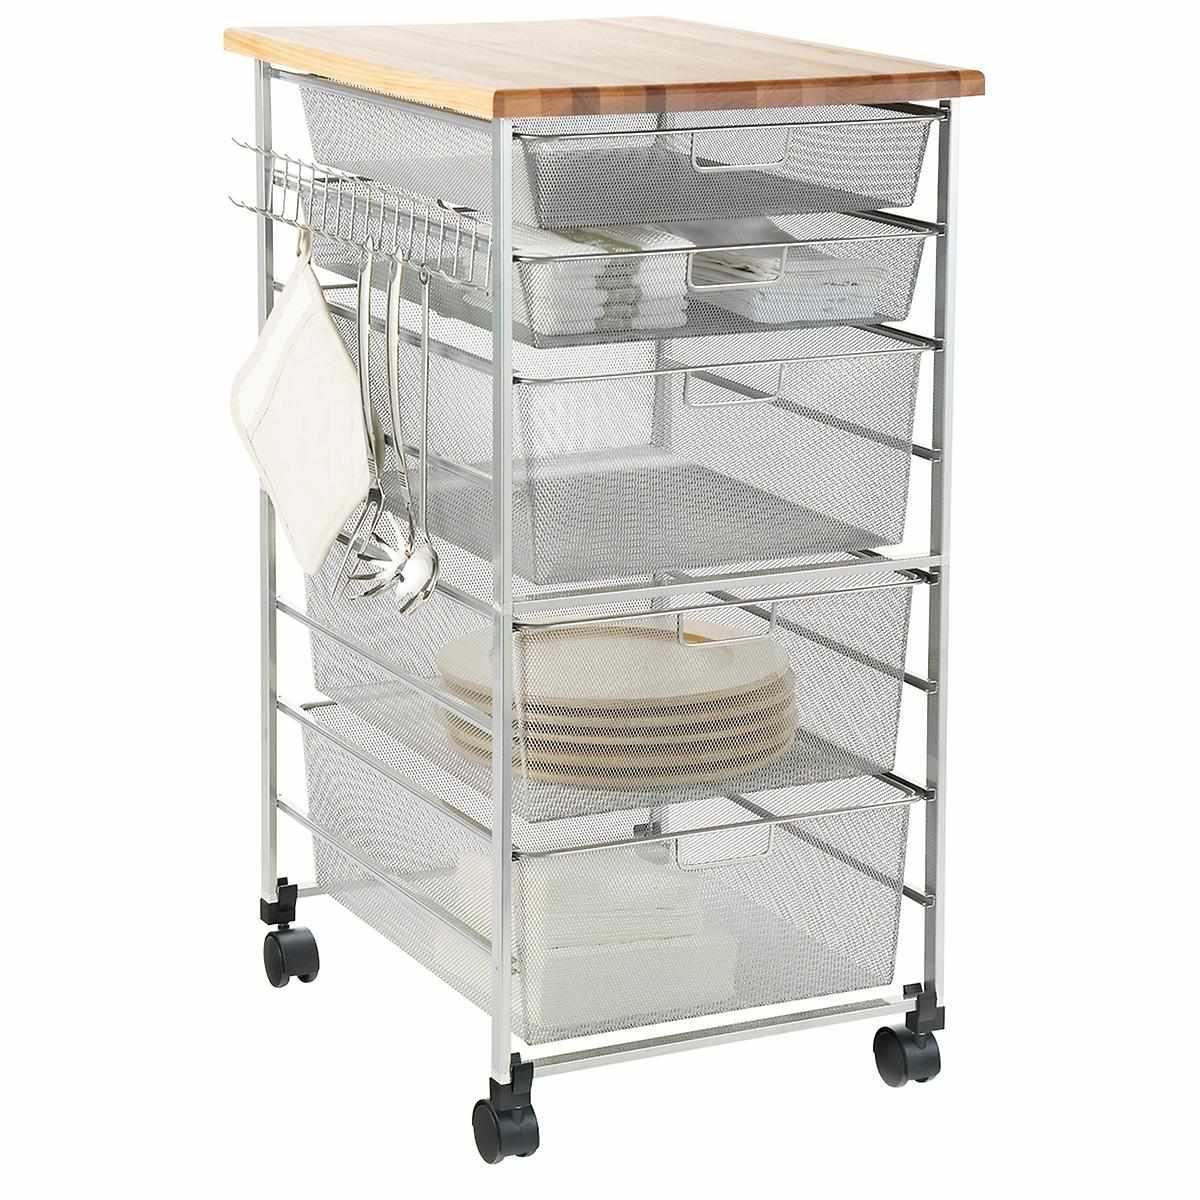 The Container Store Elfa Platinum Mesh Kitchen Cart